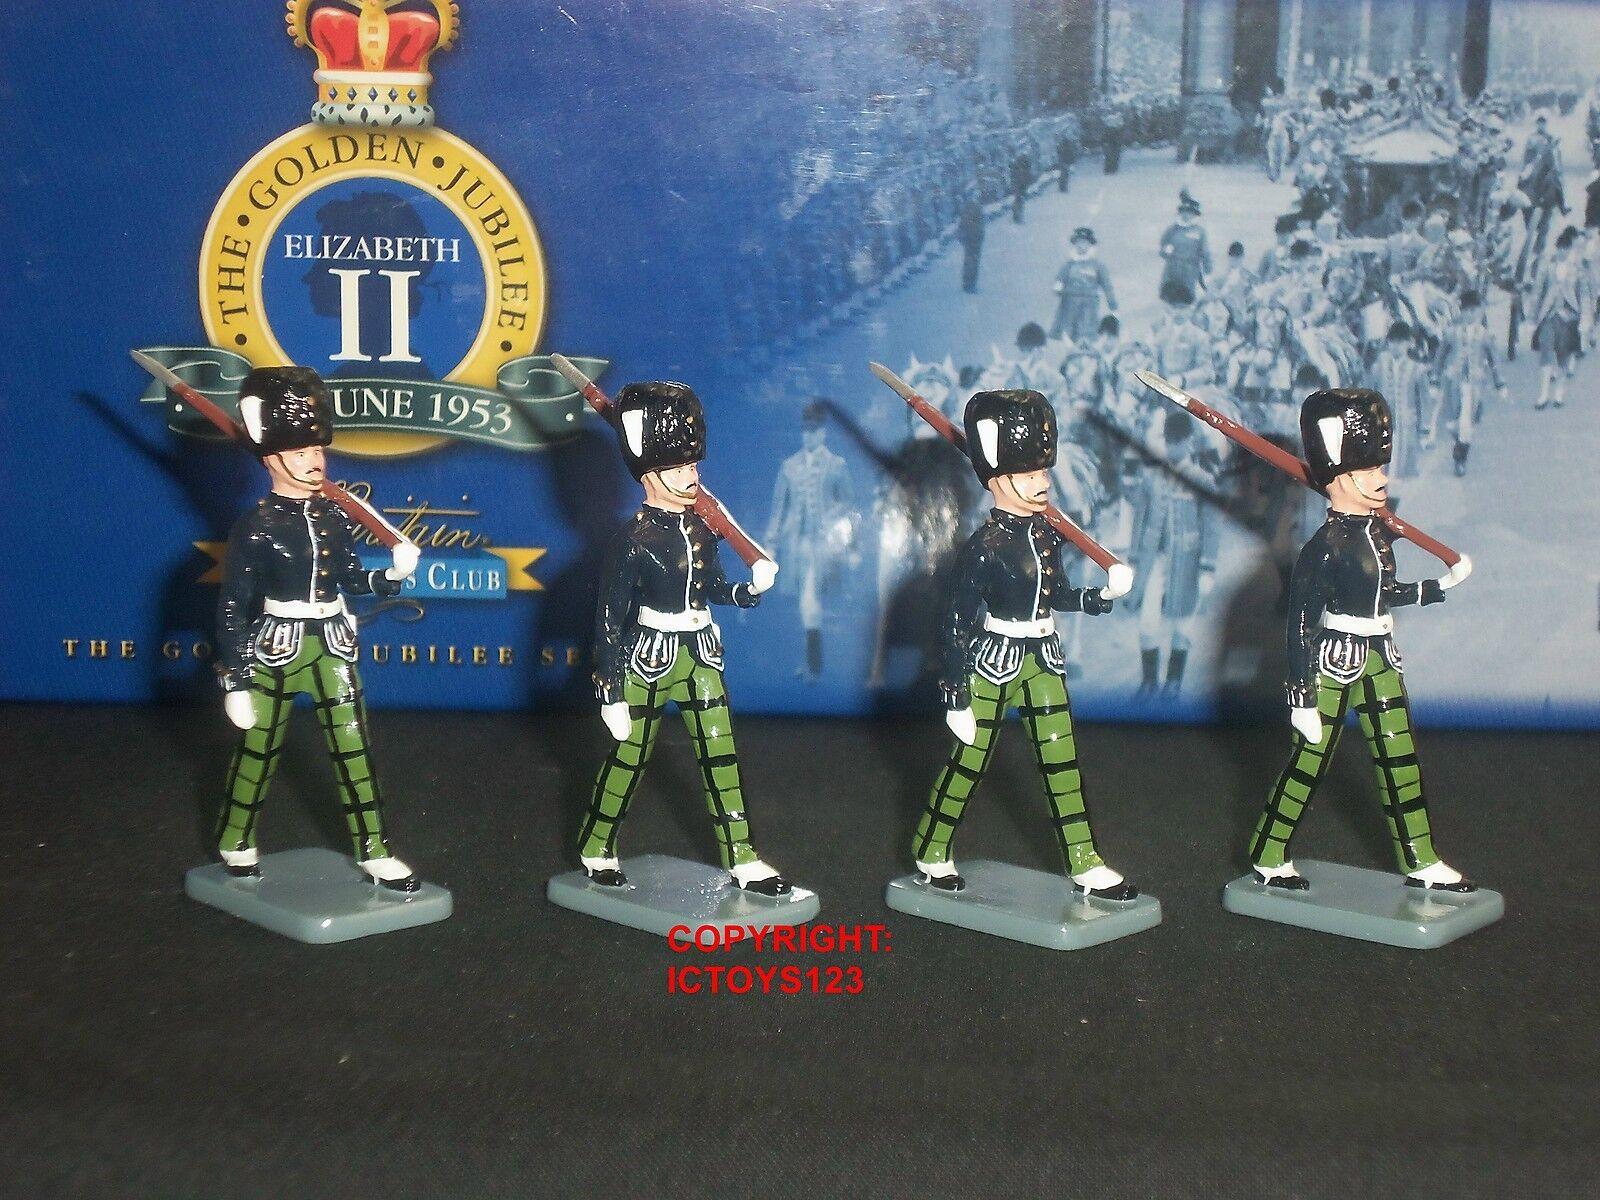 BRITAINS 40334 COLLECTORS CLUB ROYAL SCOTS FUSILIERS ESCORT TOY SOLDIER SET